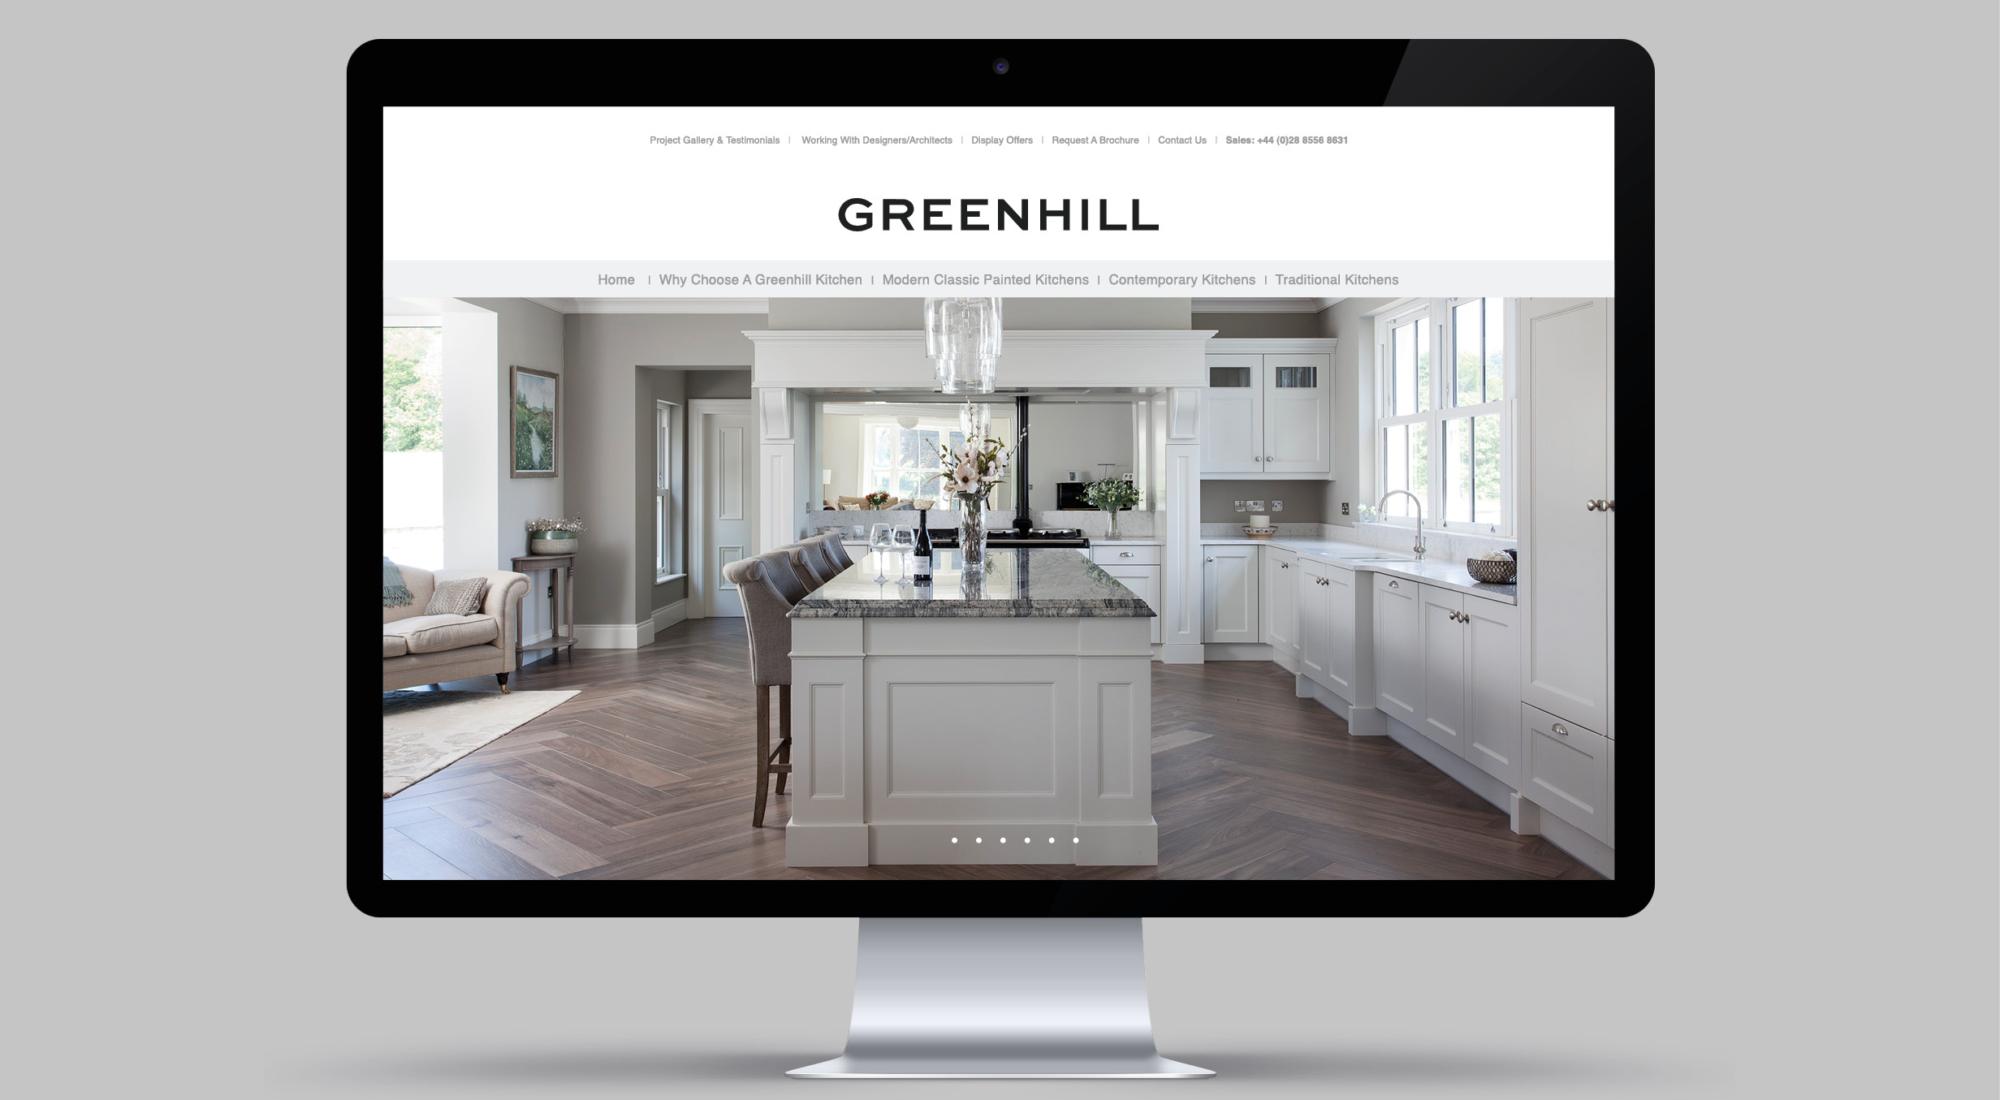 https://alanjacksondesign.co.uk/wp-content/uploads/2021/09/greenhill-kitchens-img5.jpg